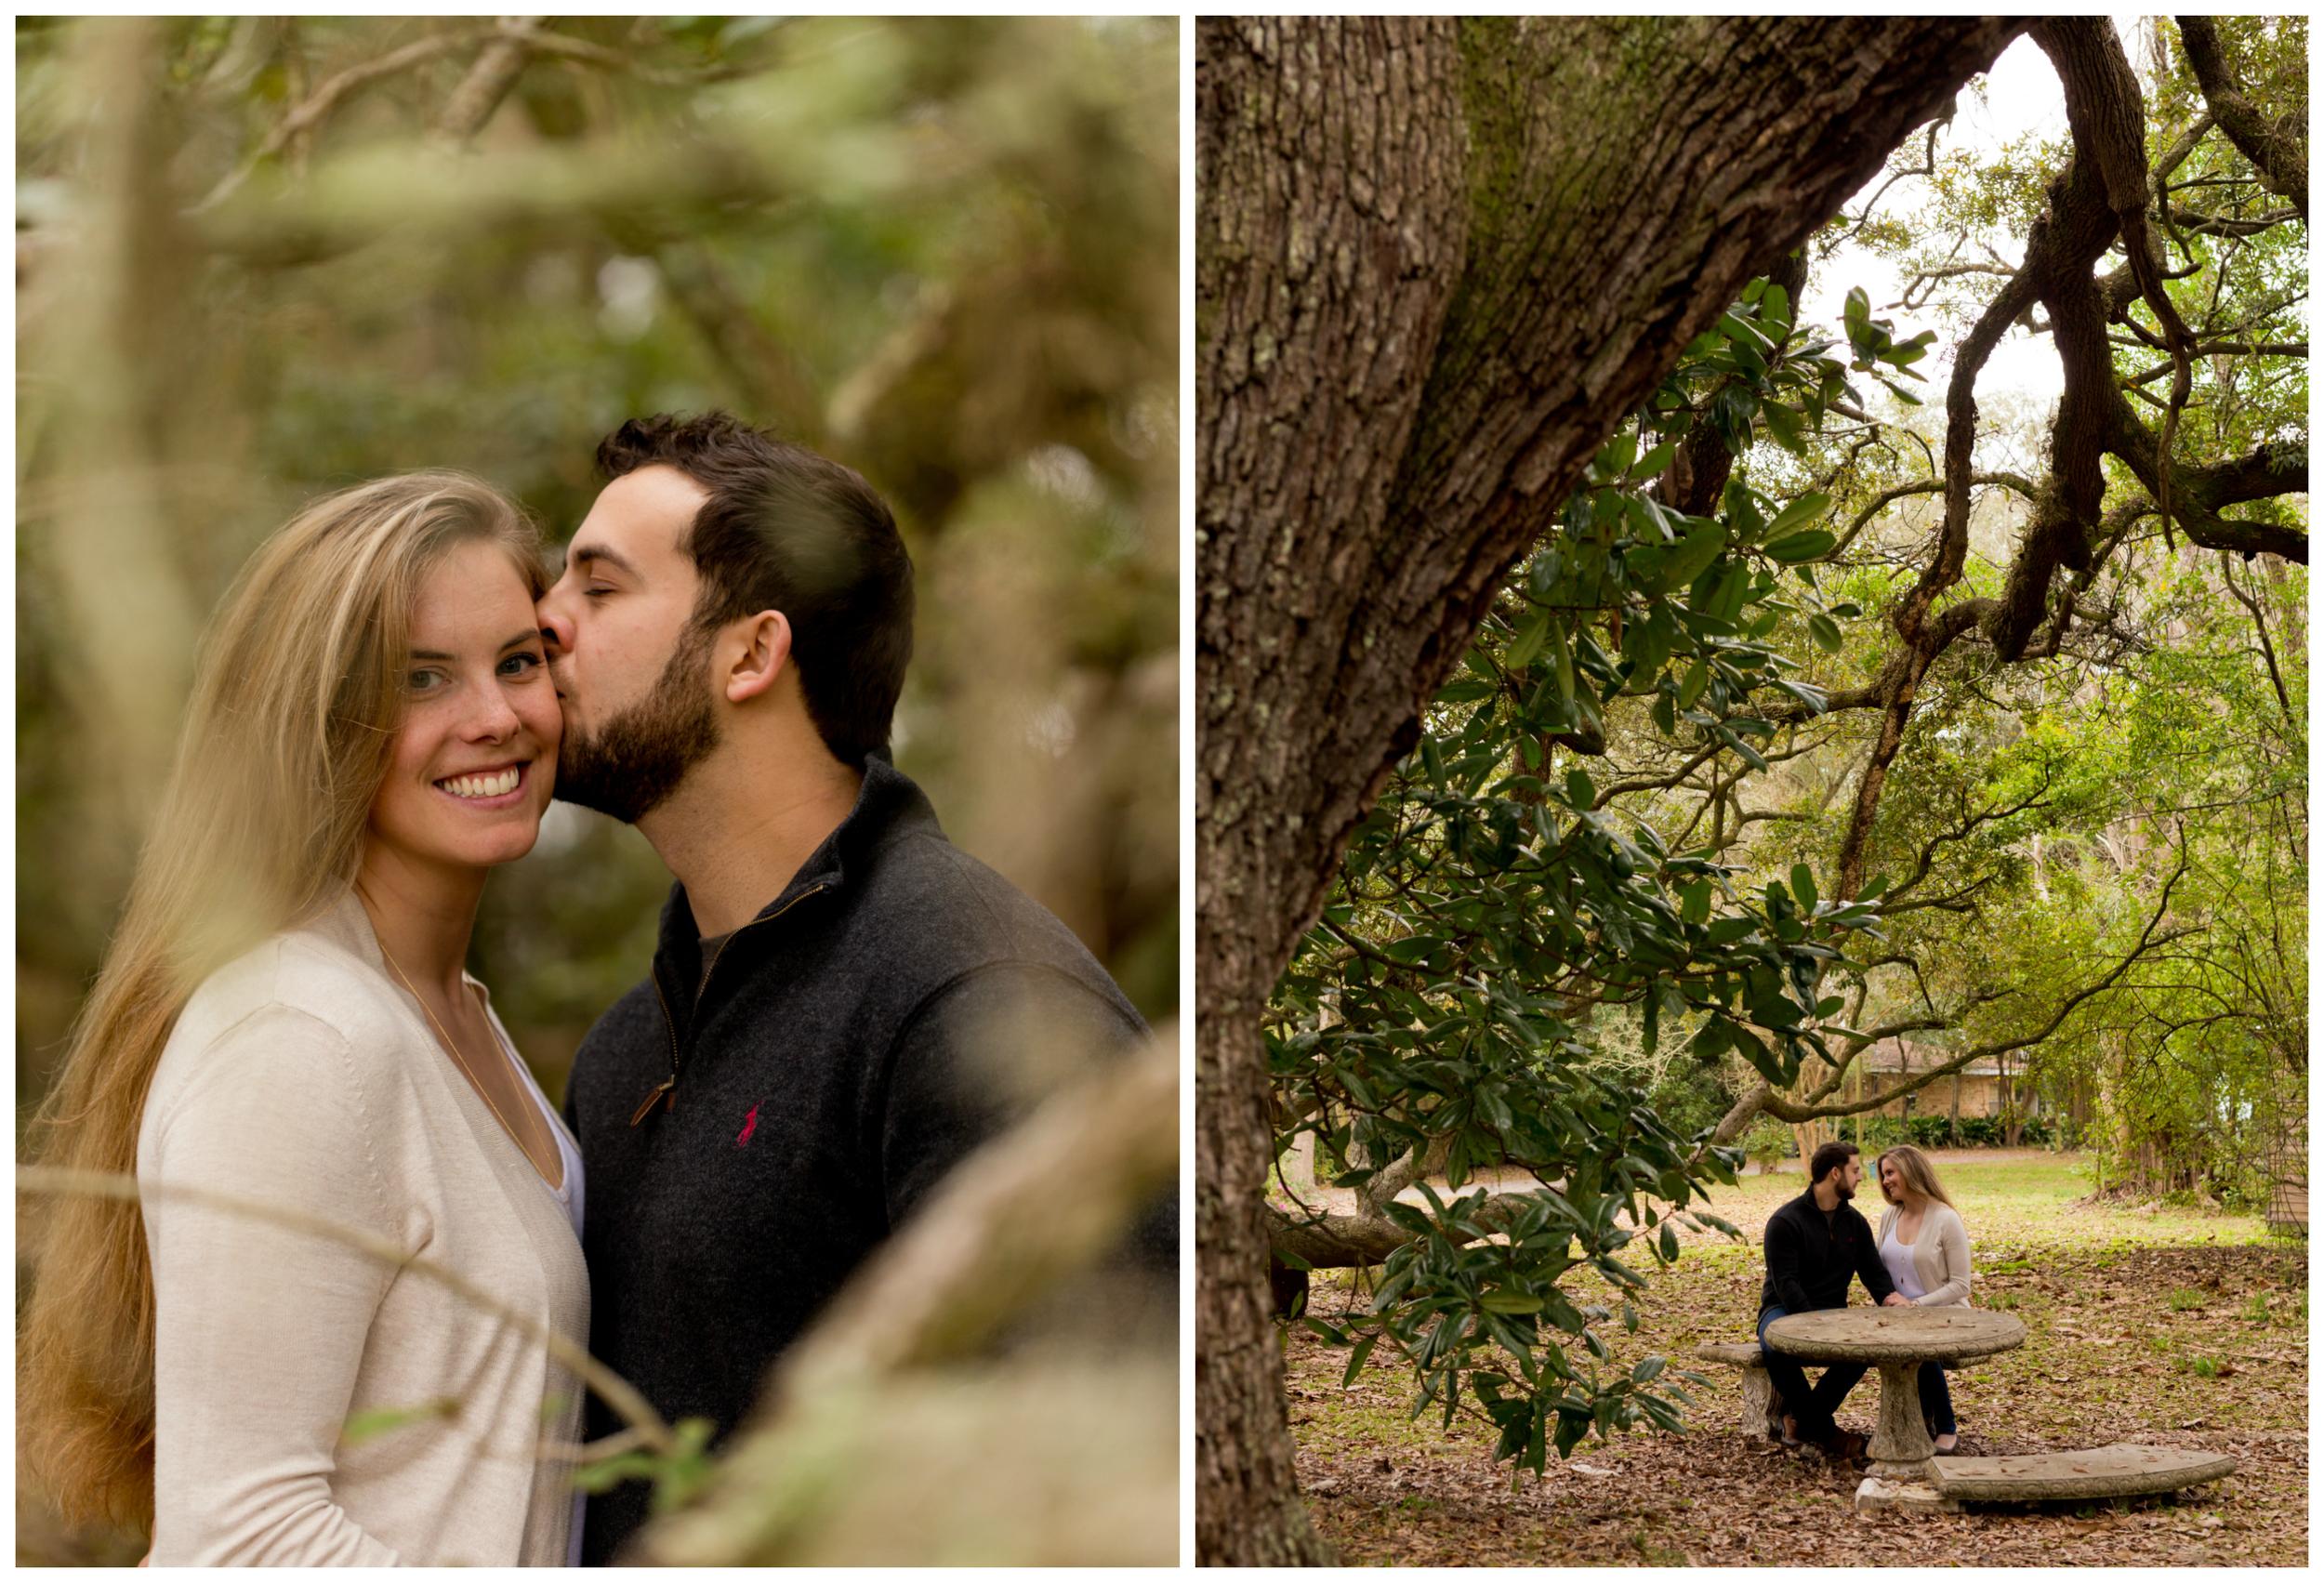 outdoorsy engagment portraits